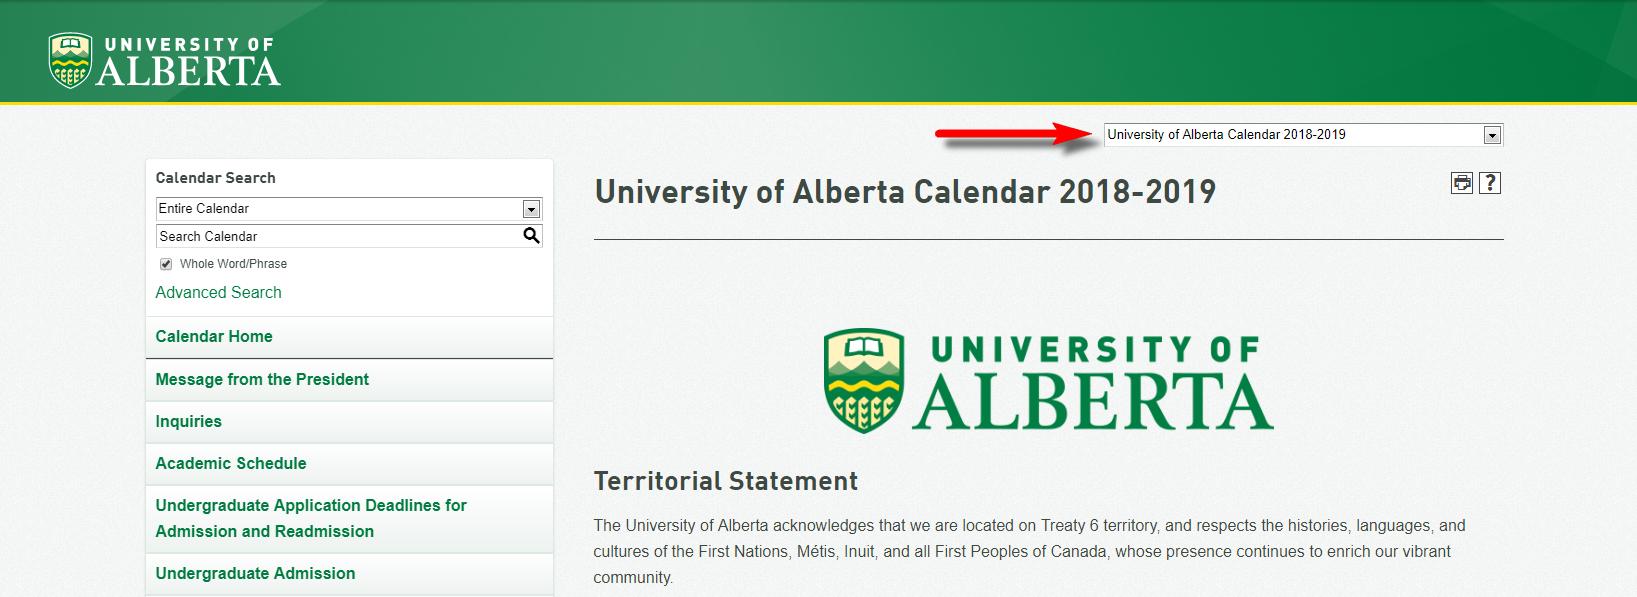 Uofa Fall 2020 Calendar.University Calendar Quick Start Guide University Of